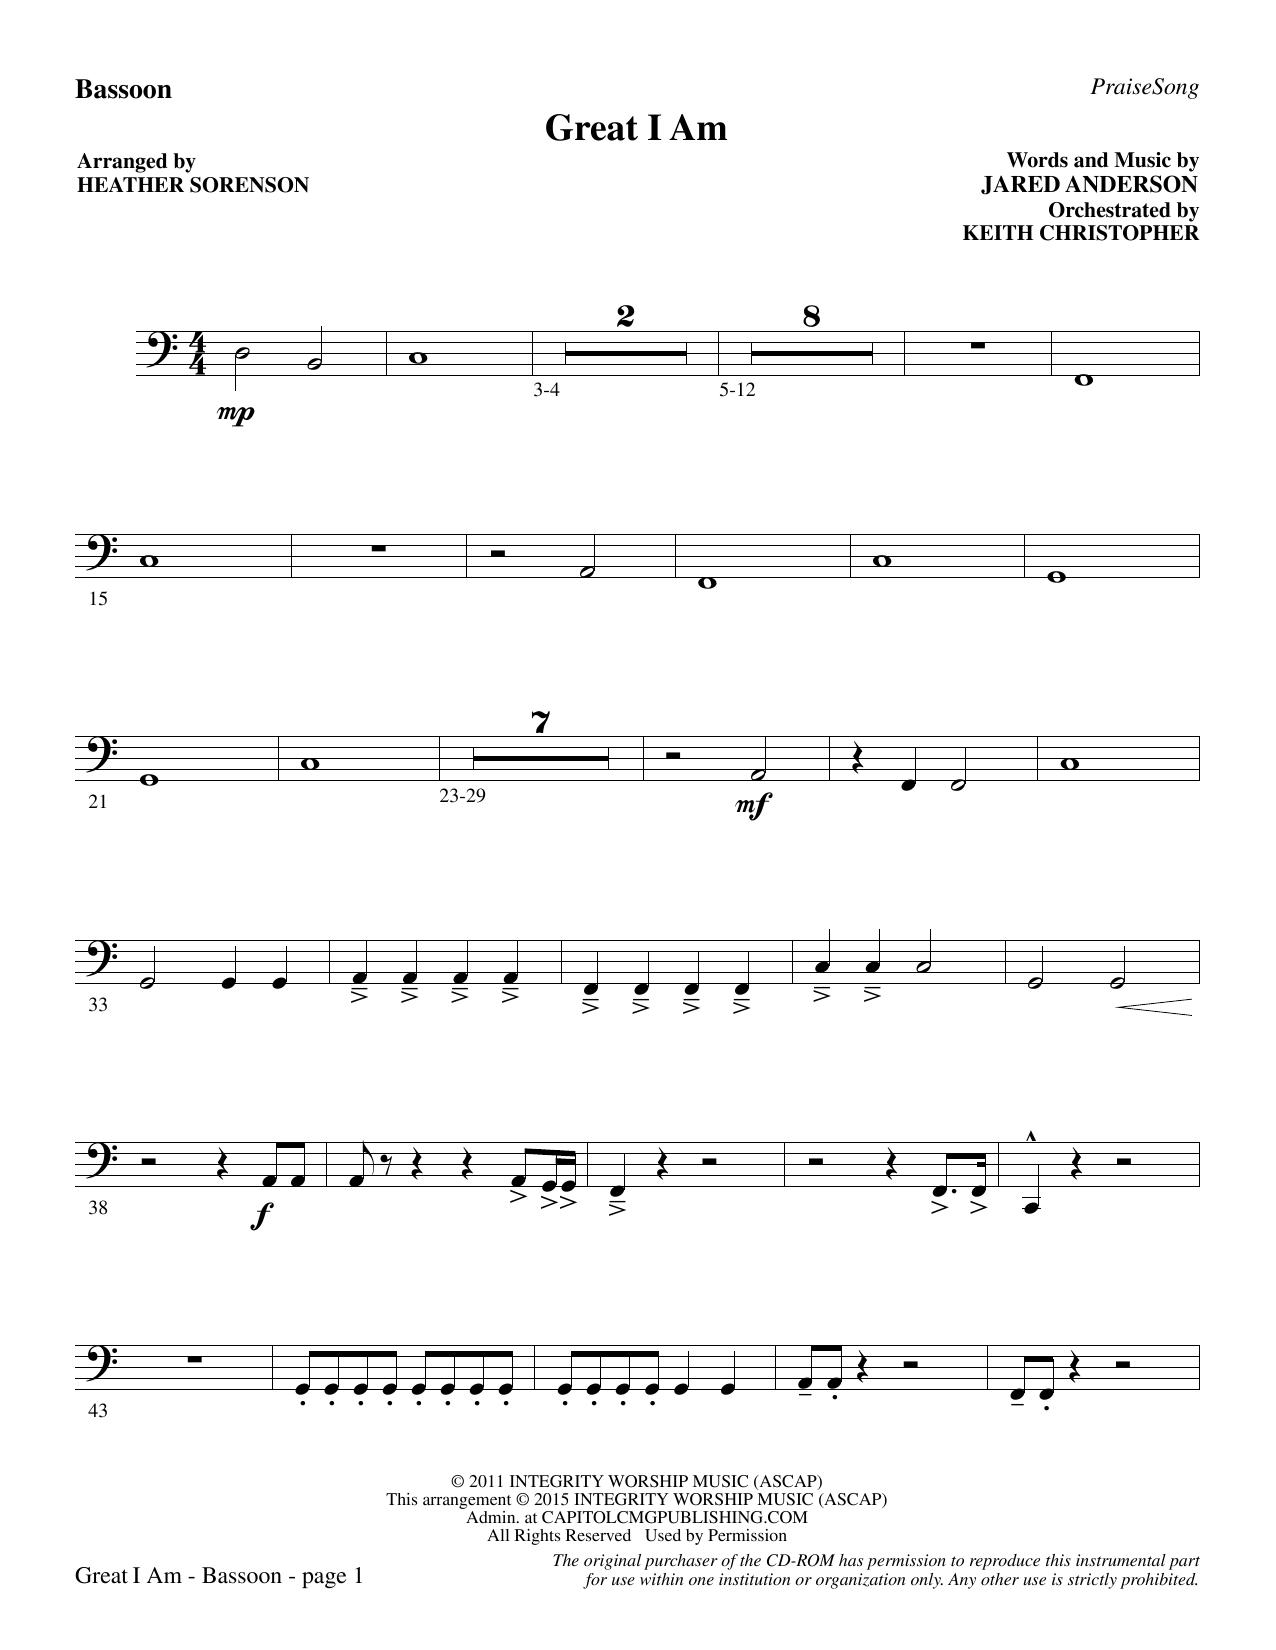 Great I Am - Bassoon sheet music